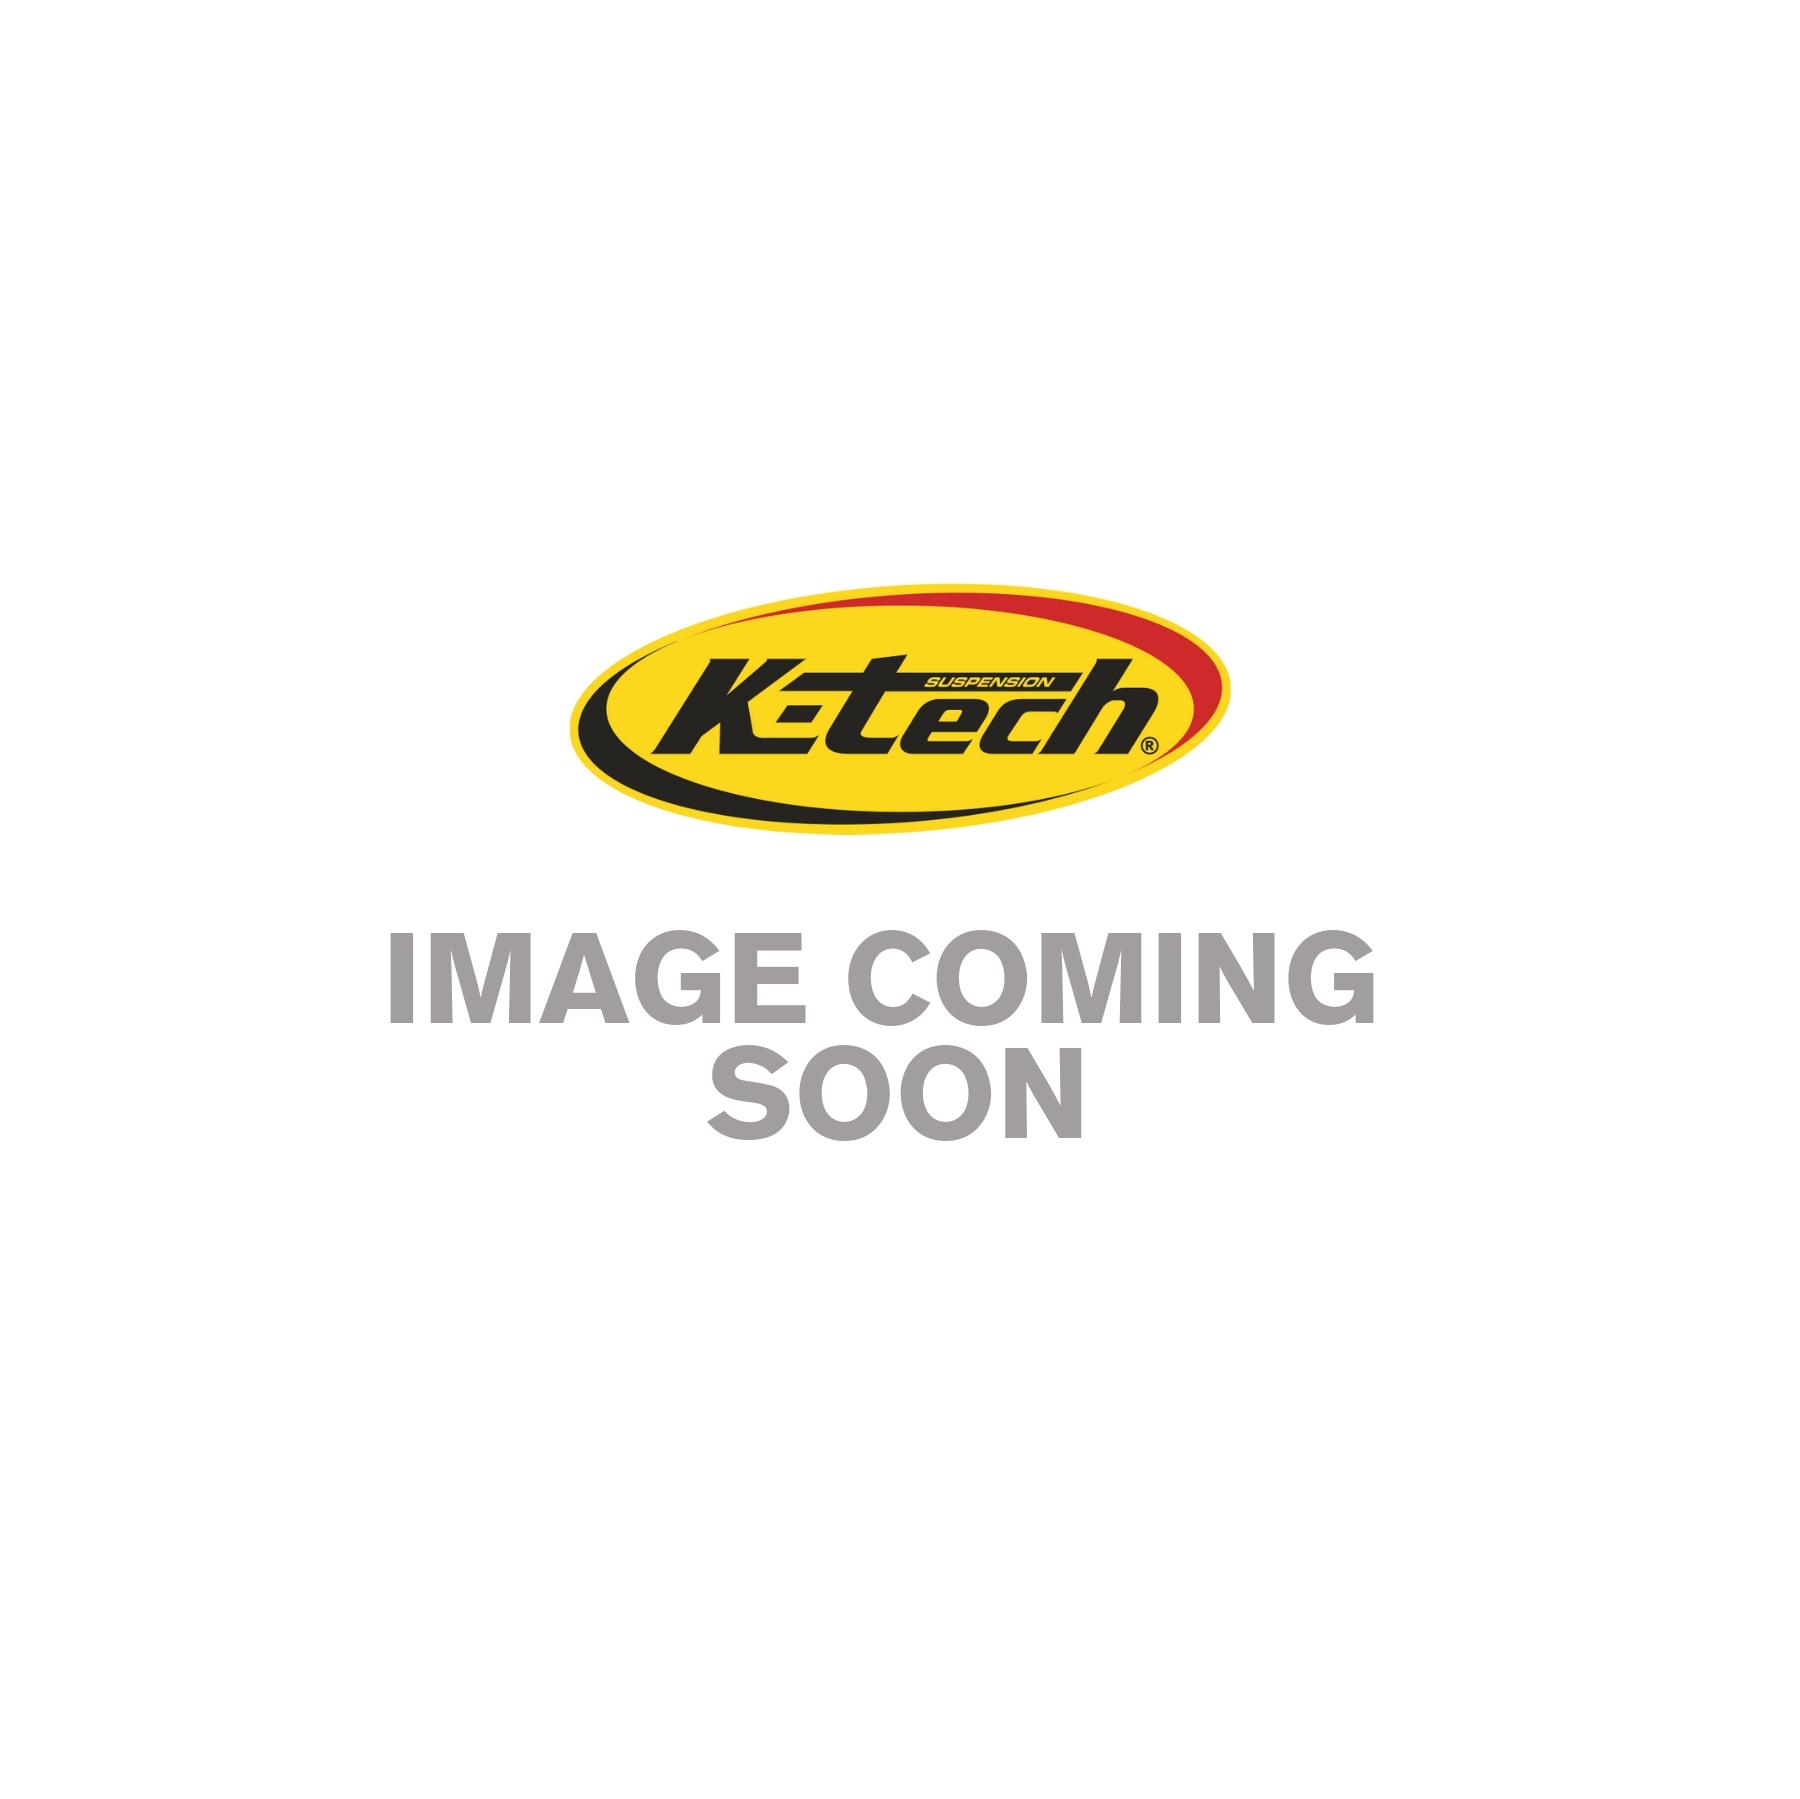 Front Fork Slide Bush (48.70x20 x1.00) -KYB/SHOWA/WP 48mm (min order qty 10)